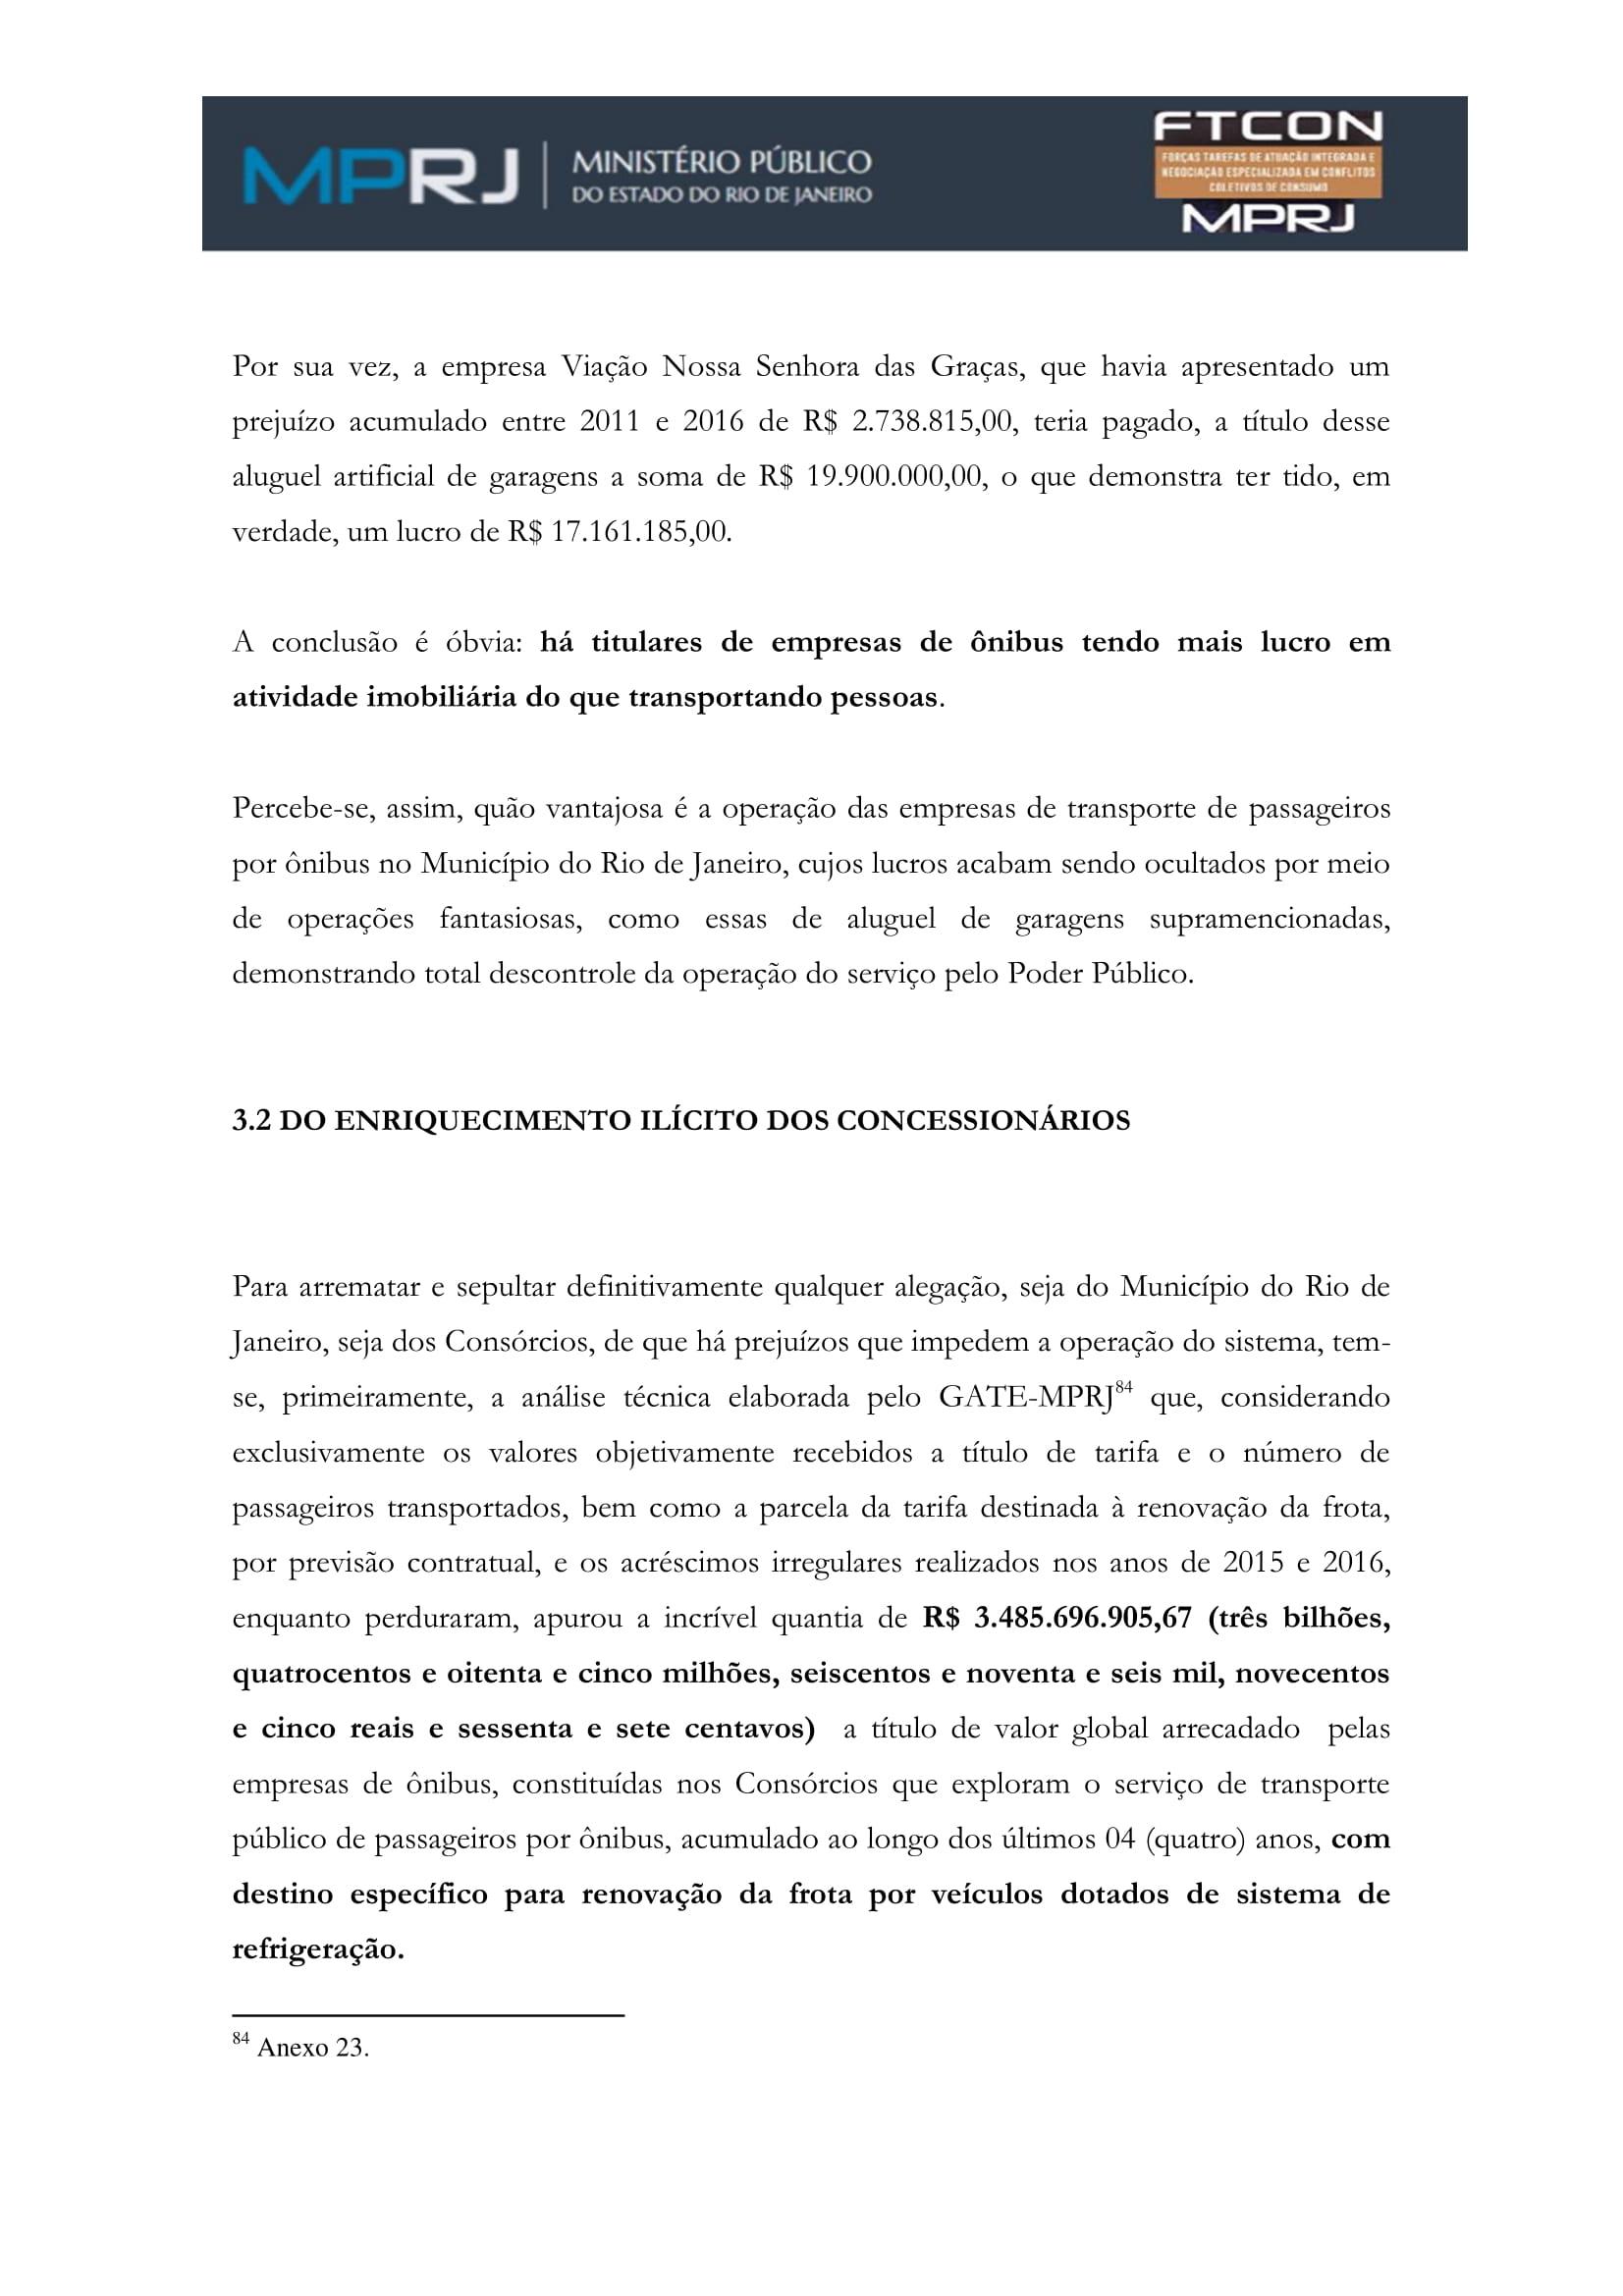 acp_caducidade_onibus_dr_rt-093